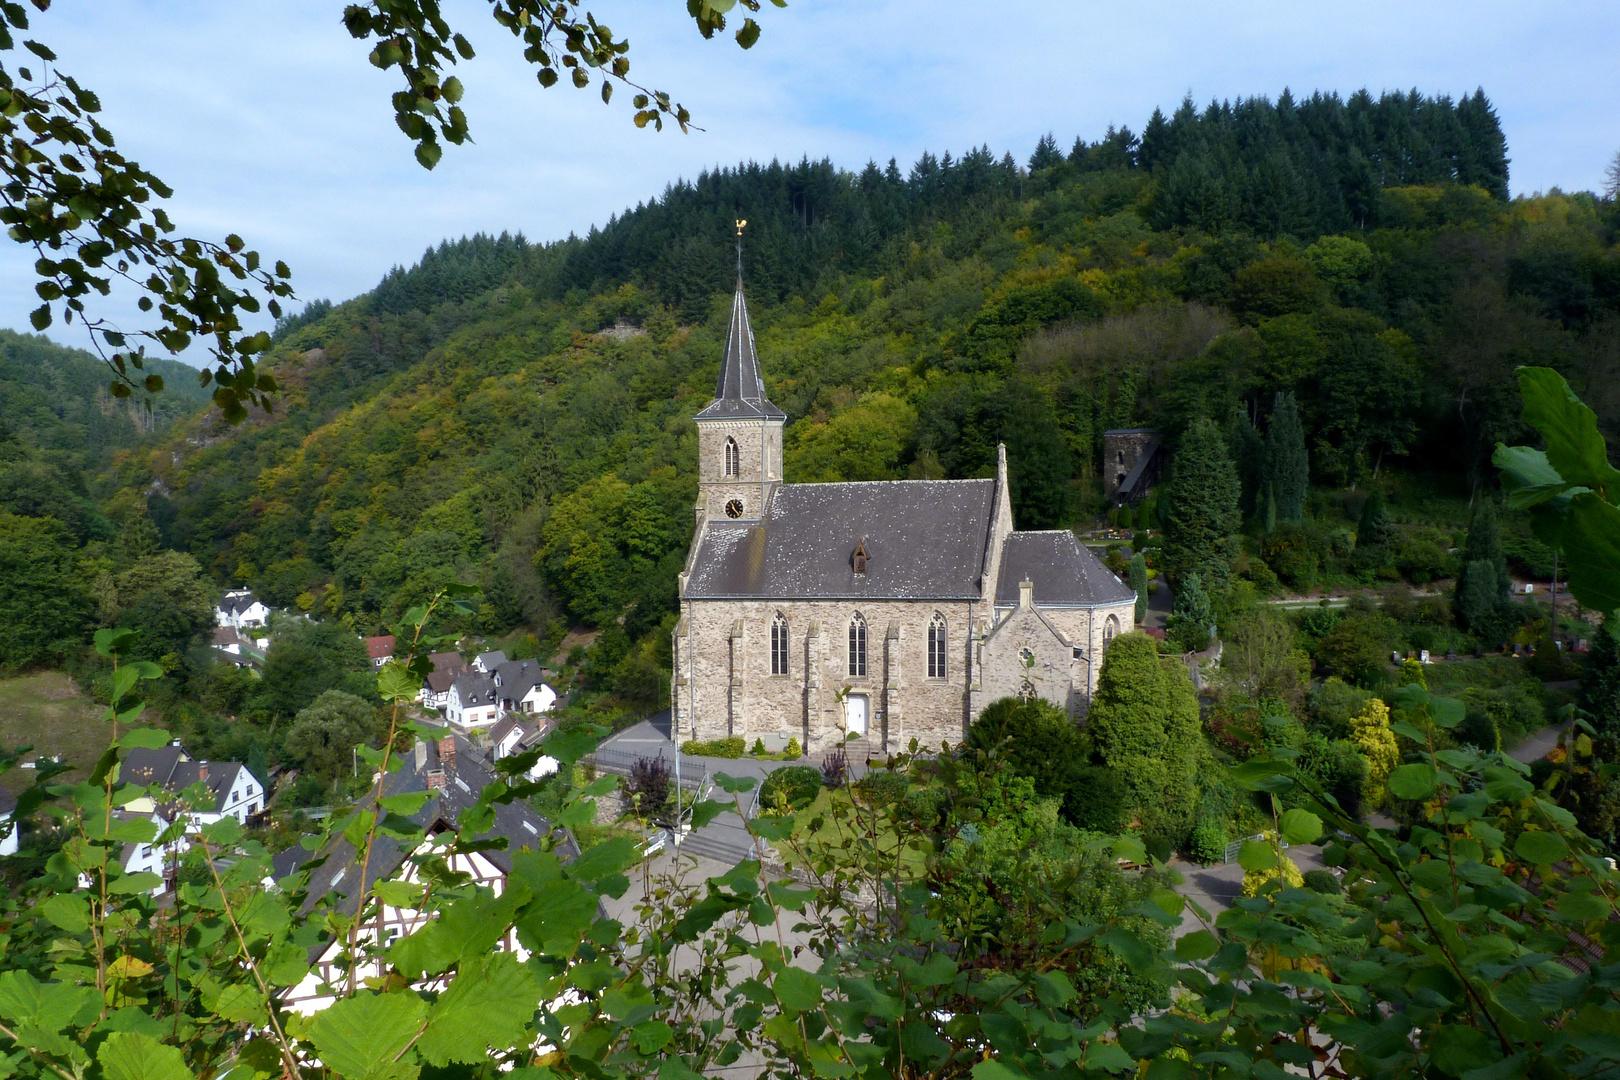 Pfarrkirche St.Katharina in Isenburg / Saynbachtal / Westerwald